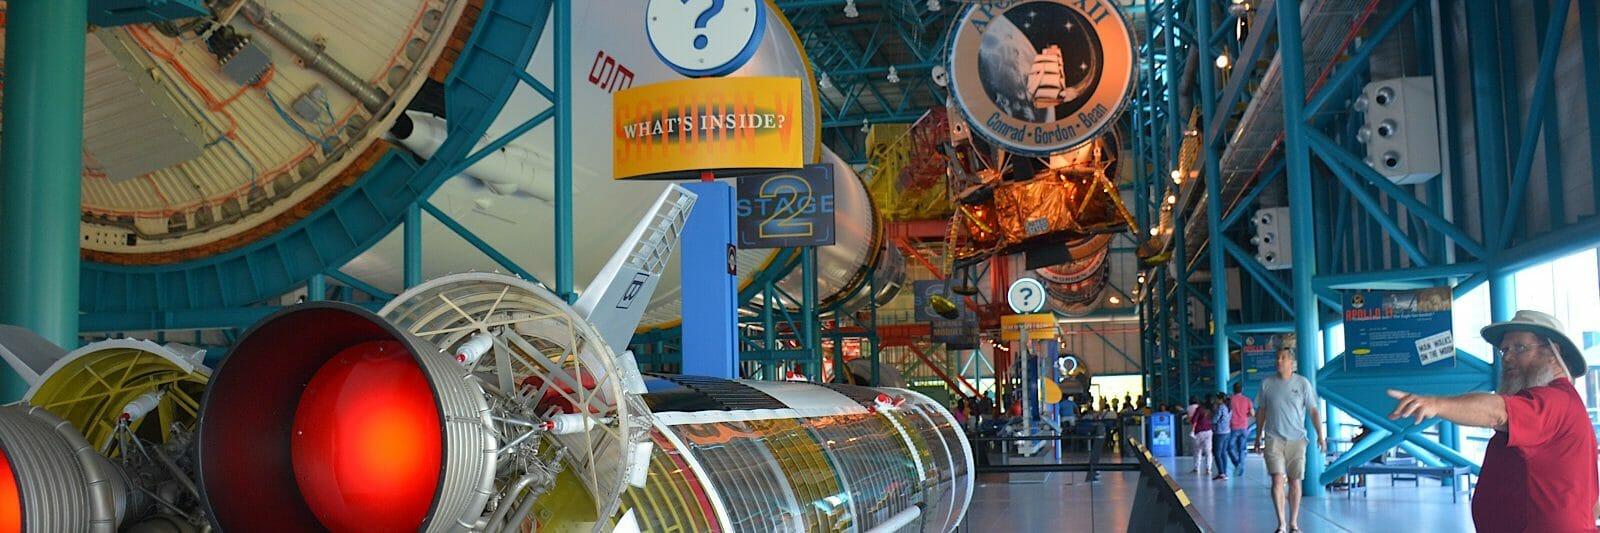 KSC Saturn V